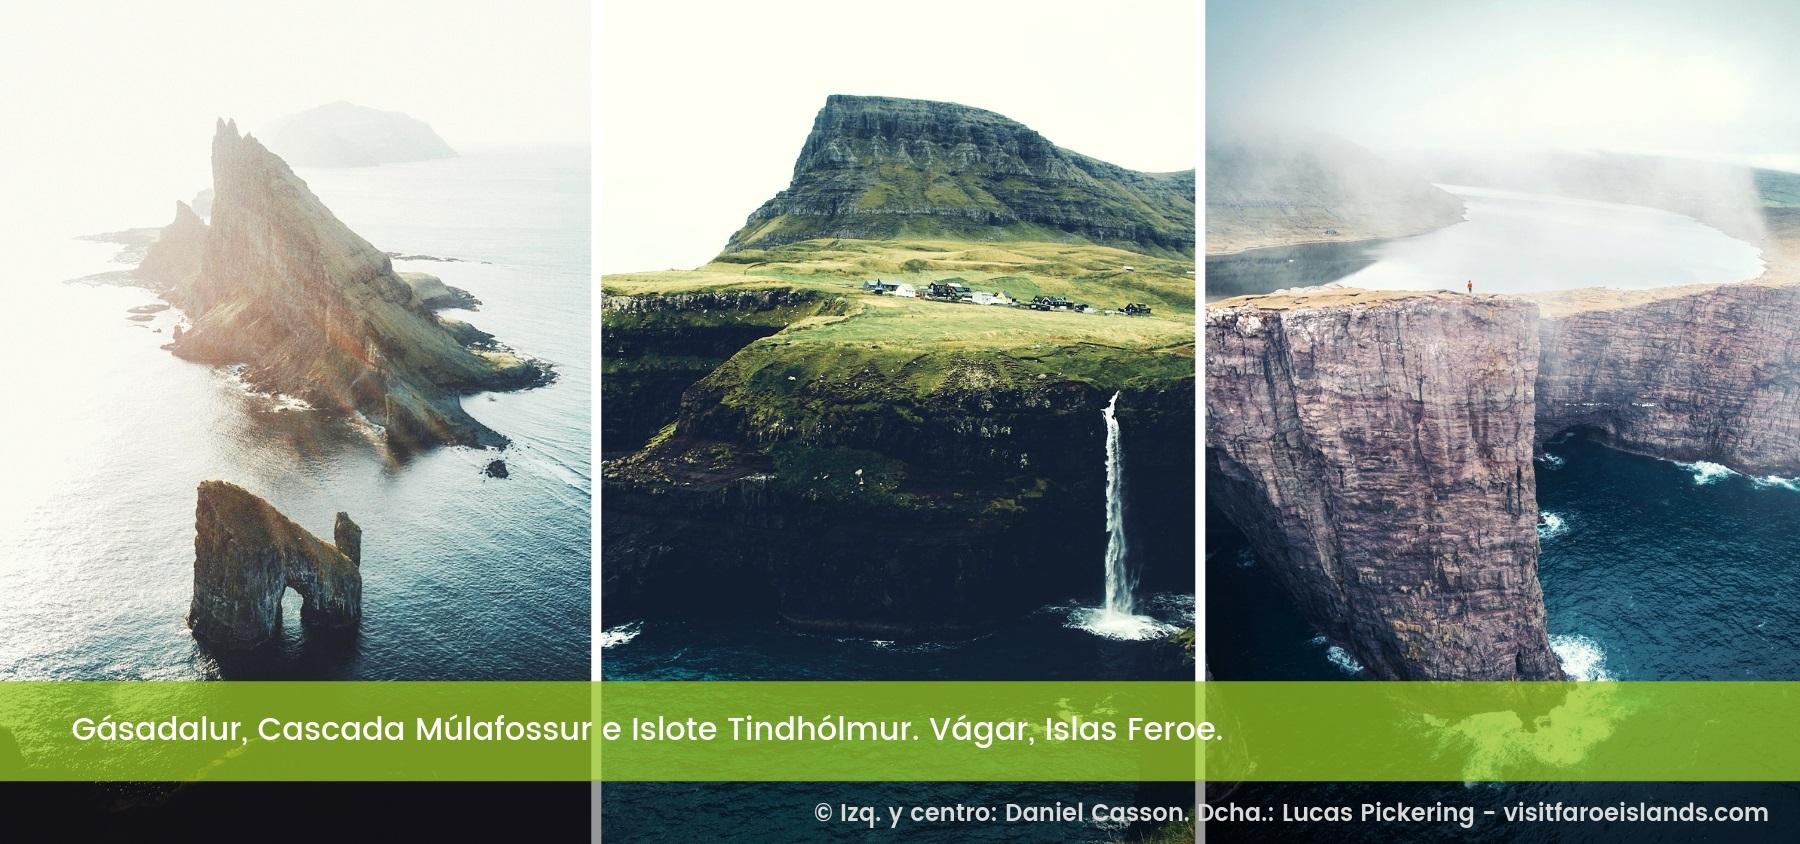 Gásadalur, Cascada Múlafossur e Islote Tindhólmur. Vágar, islas Feroe